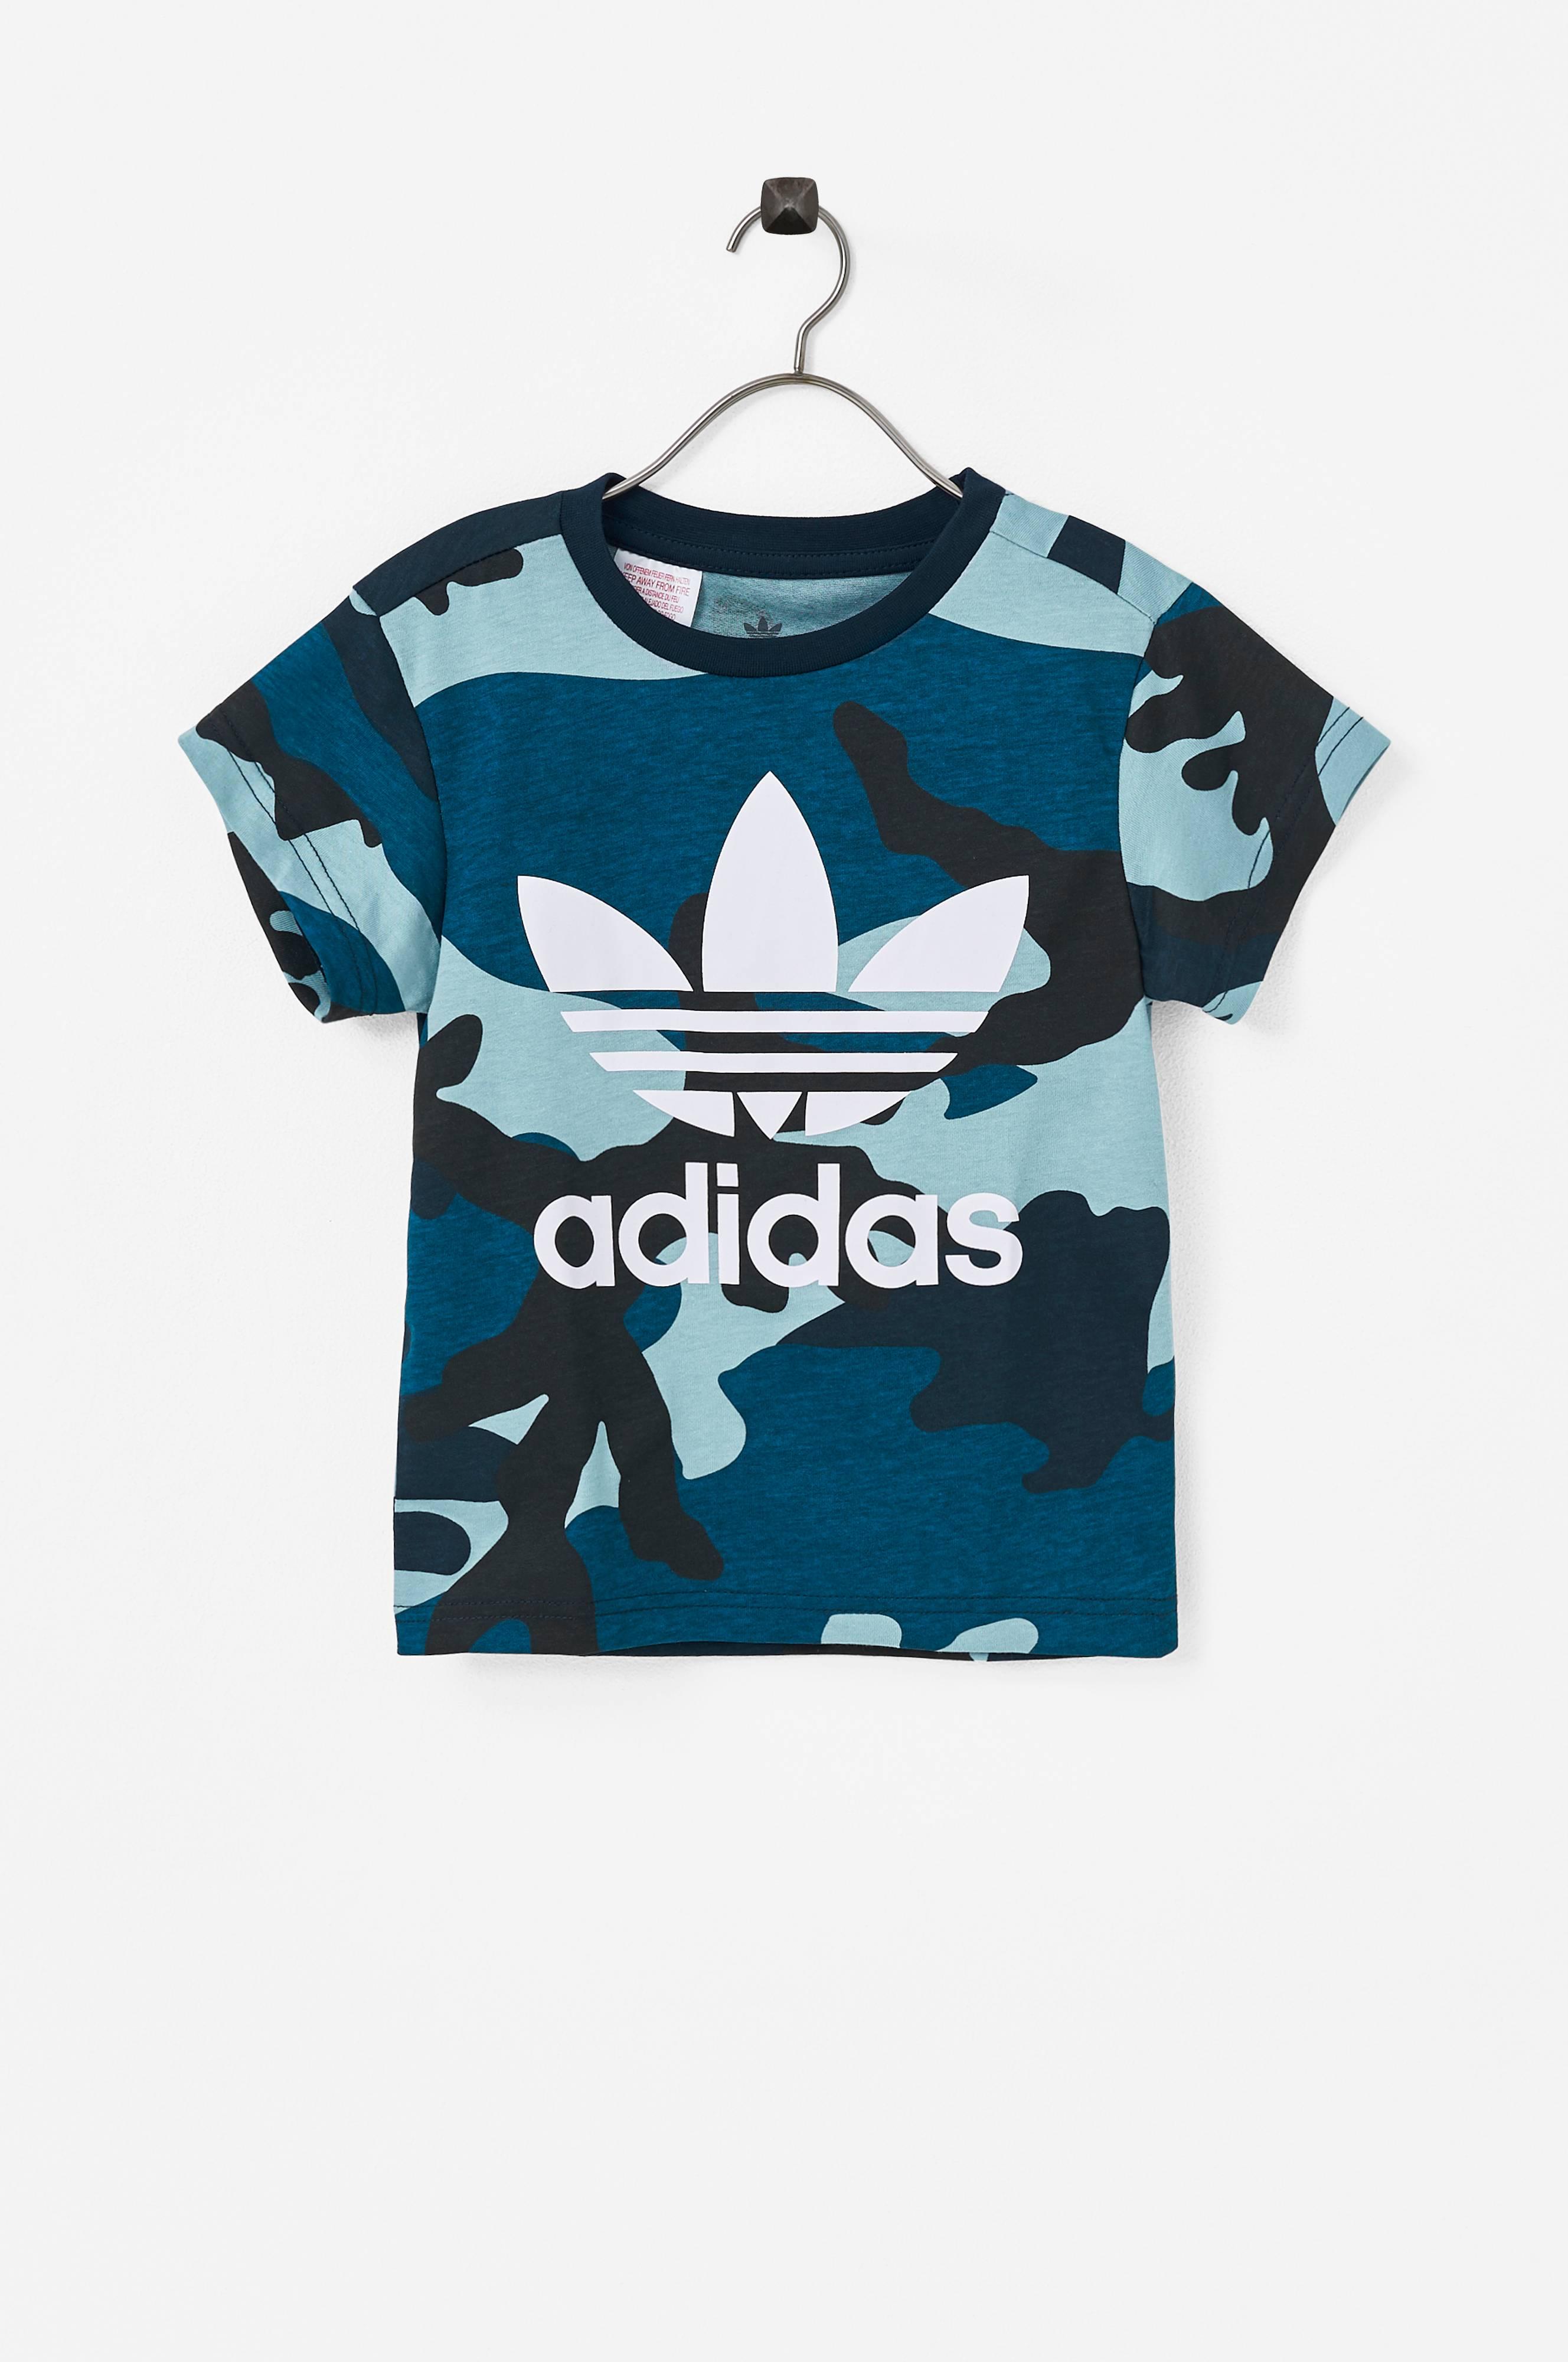 adidas Originals Barn T Skjorte Camo MulticolorWhite